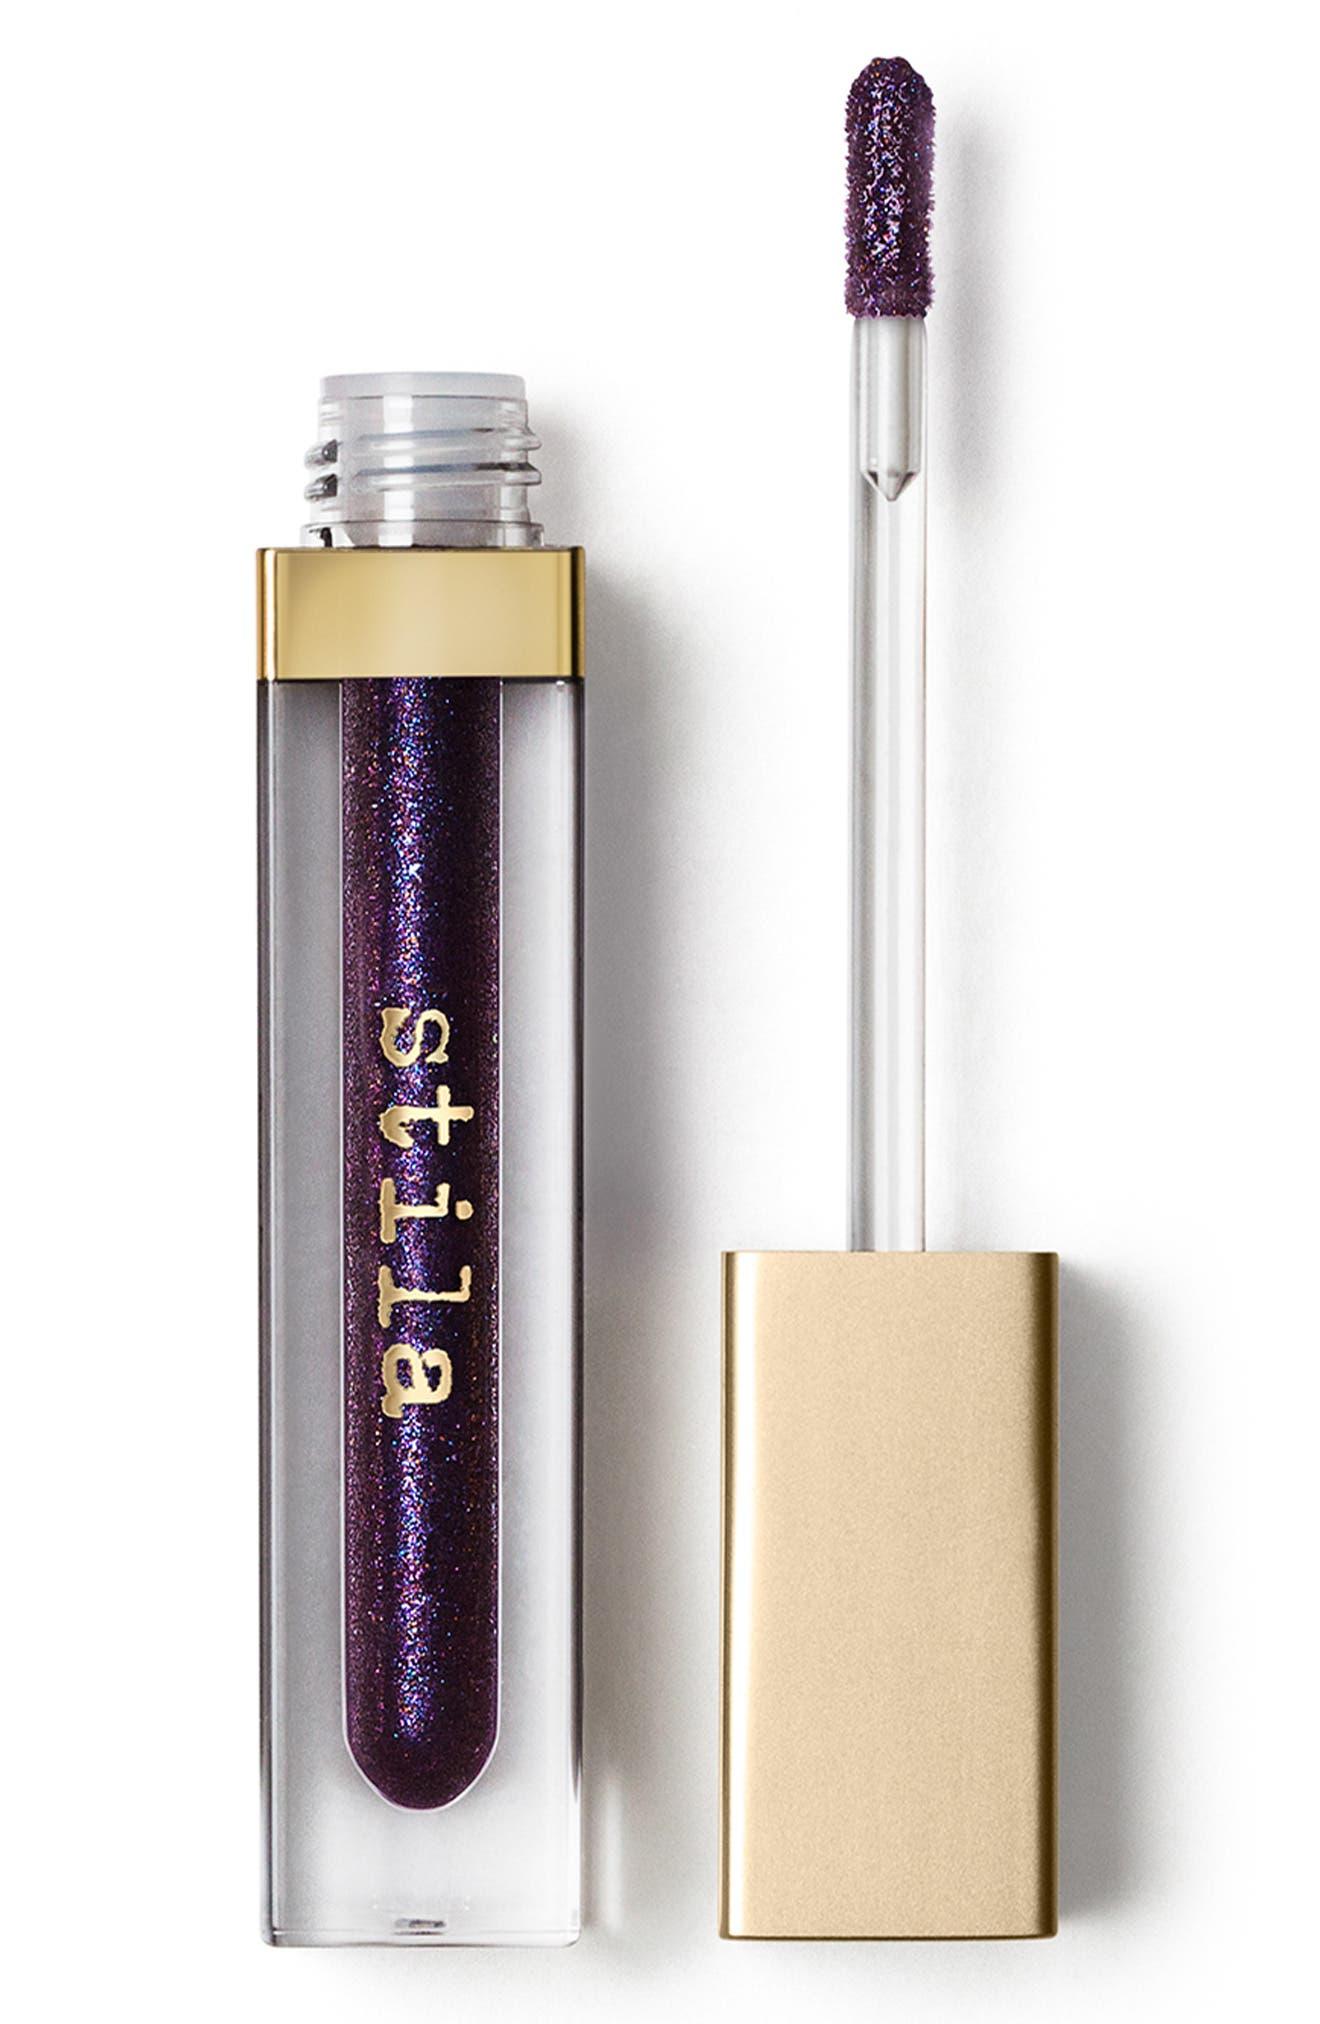 Image of Stila Beauty Boss Lip Gloss - In The Black